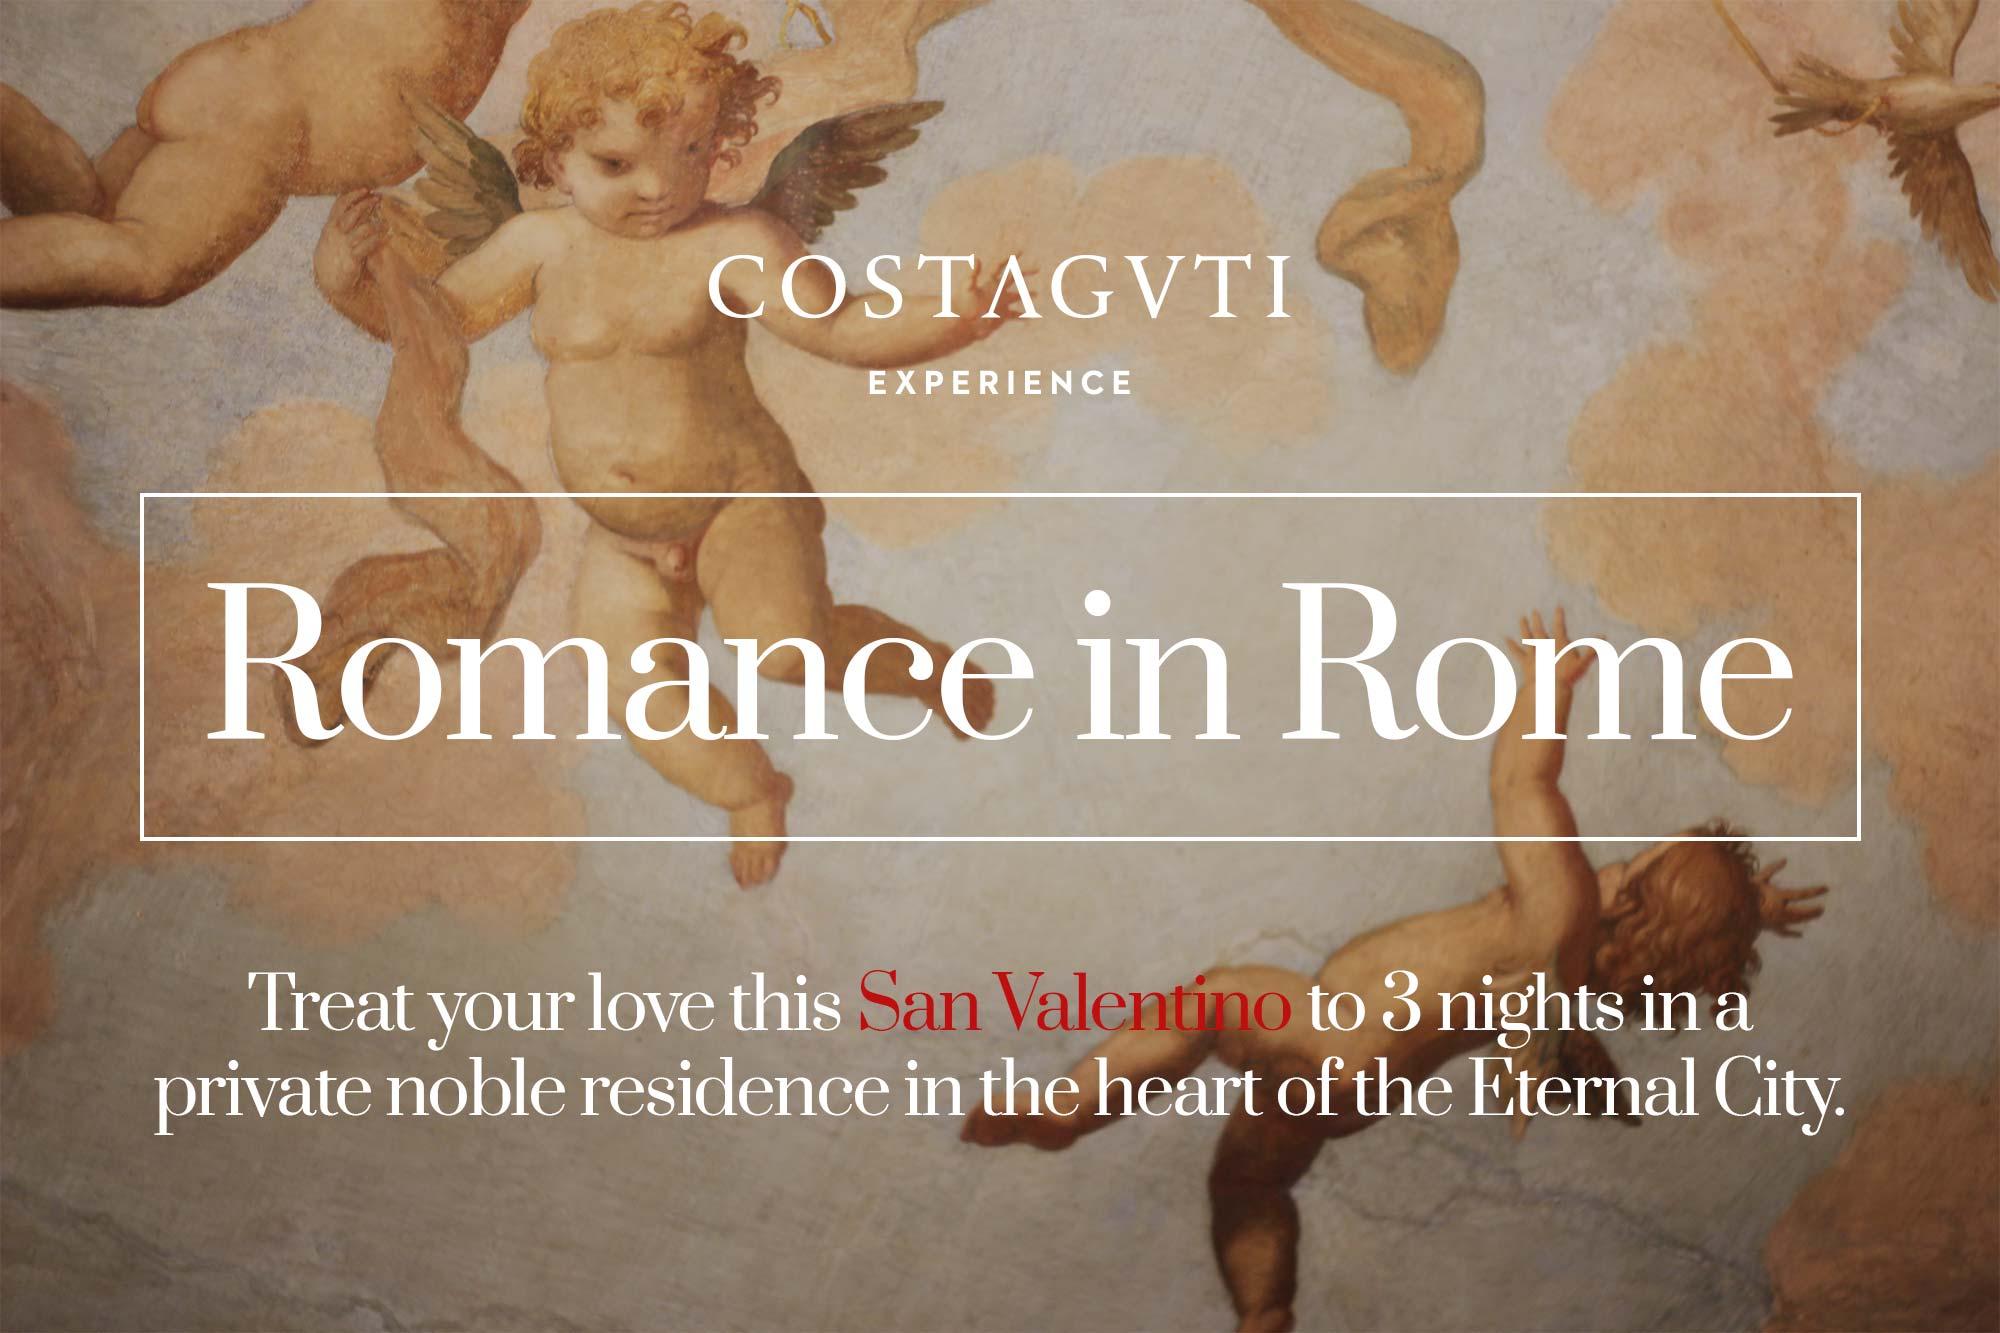 San Valentino Roma